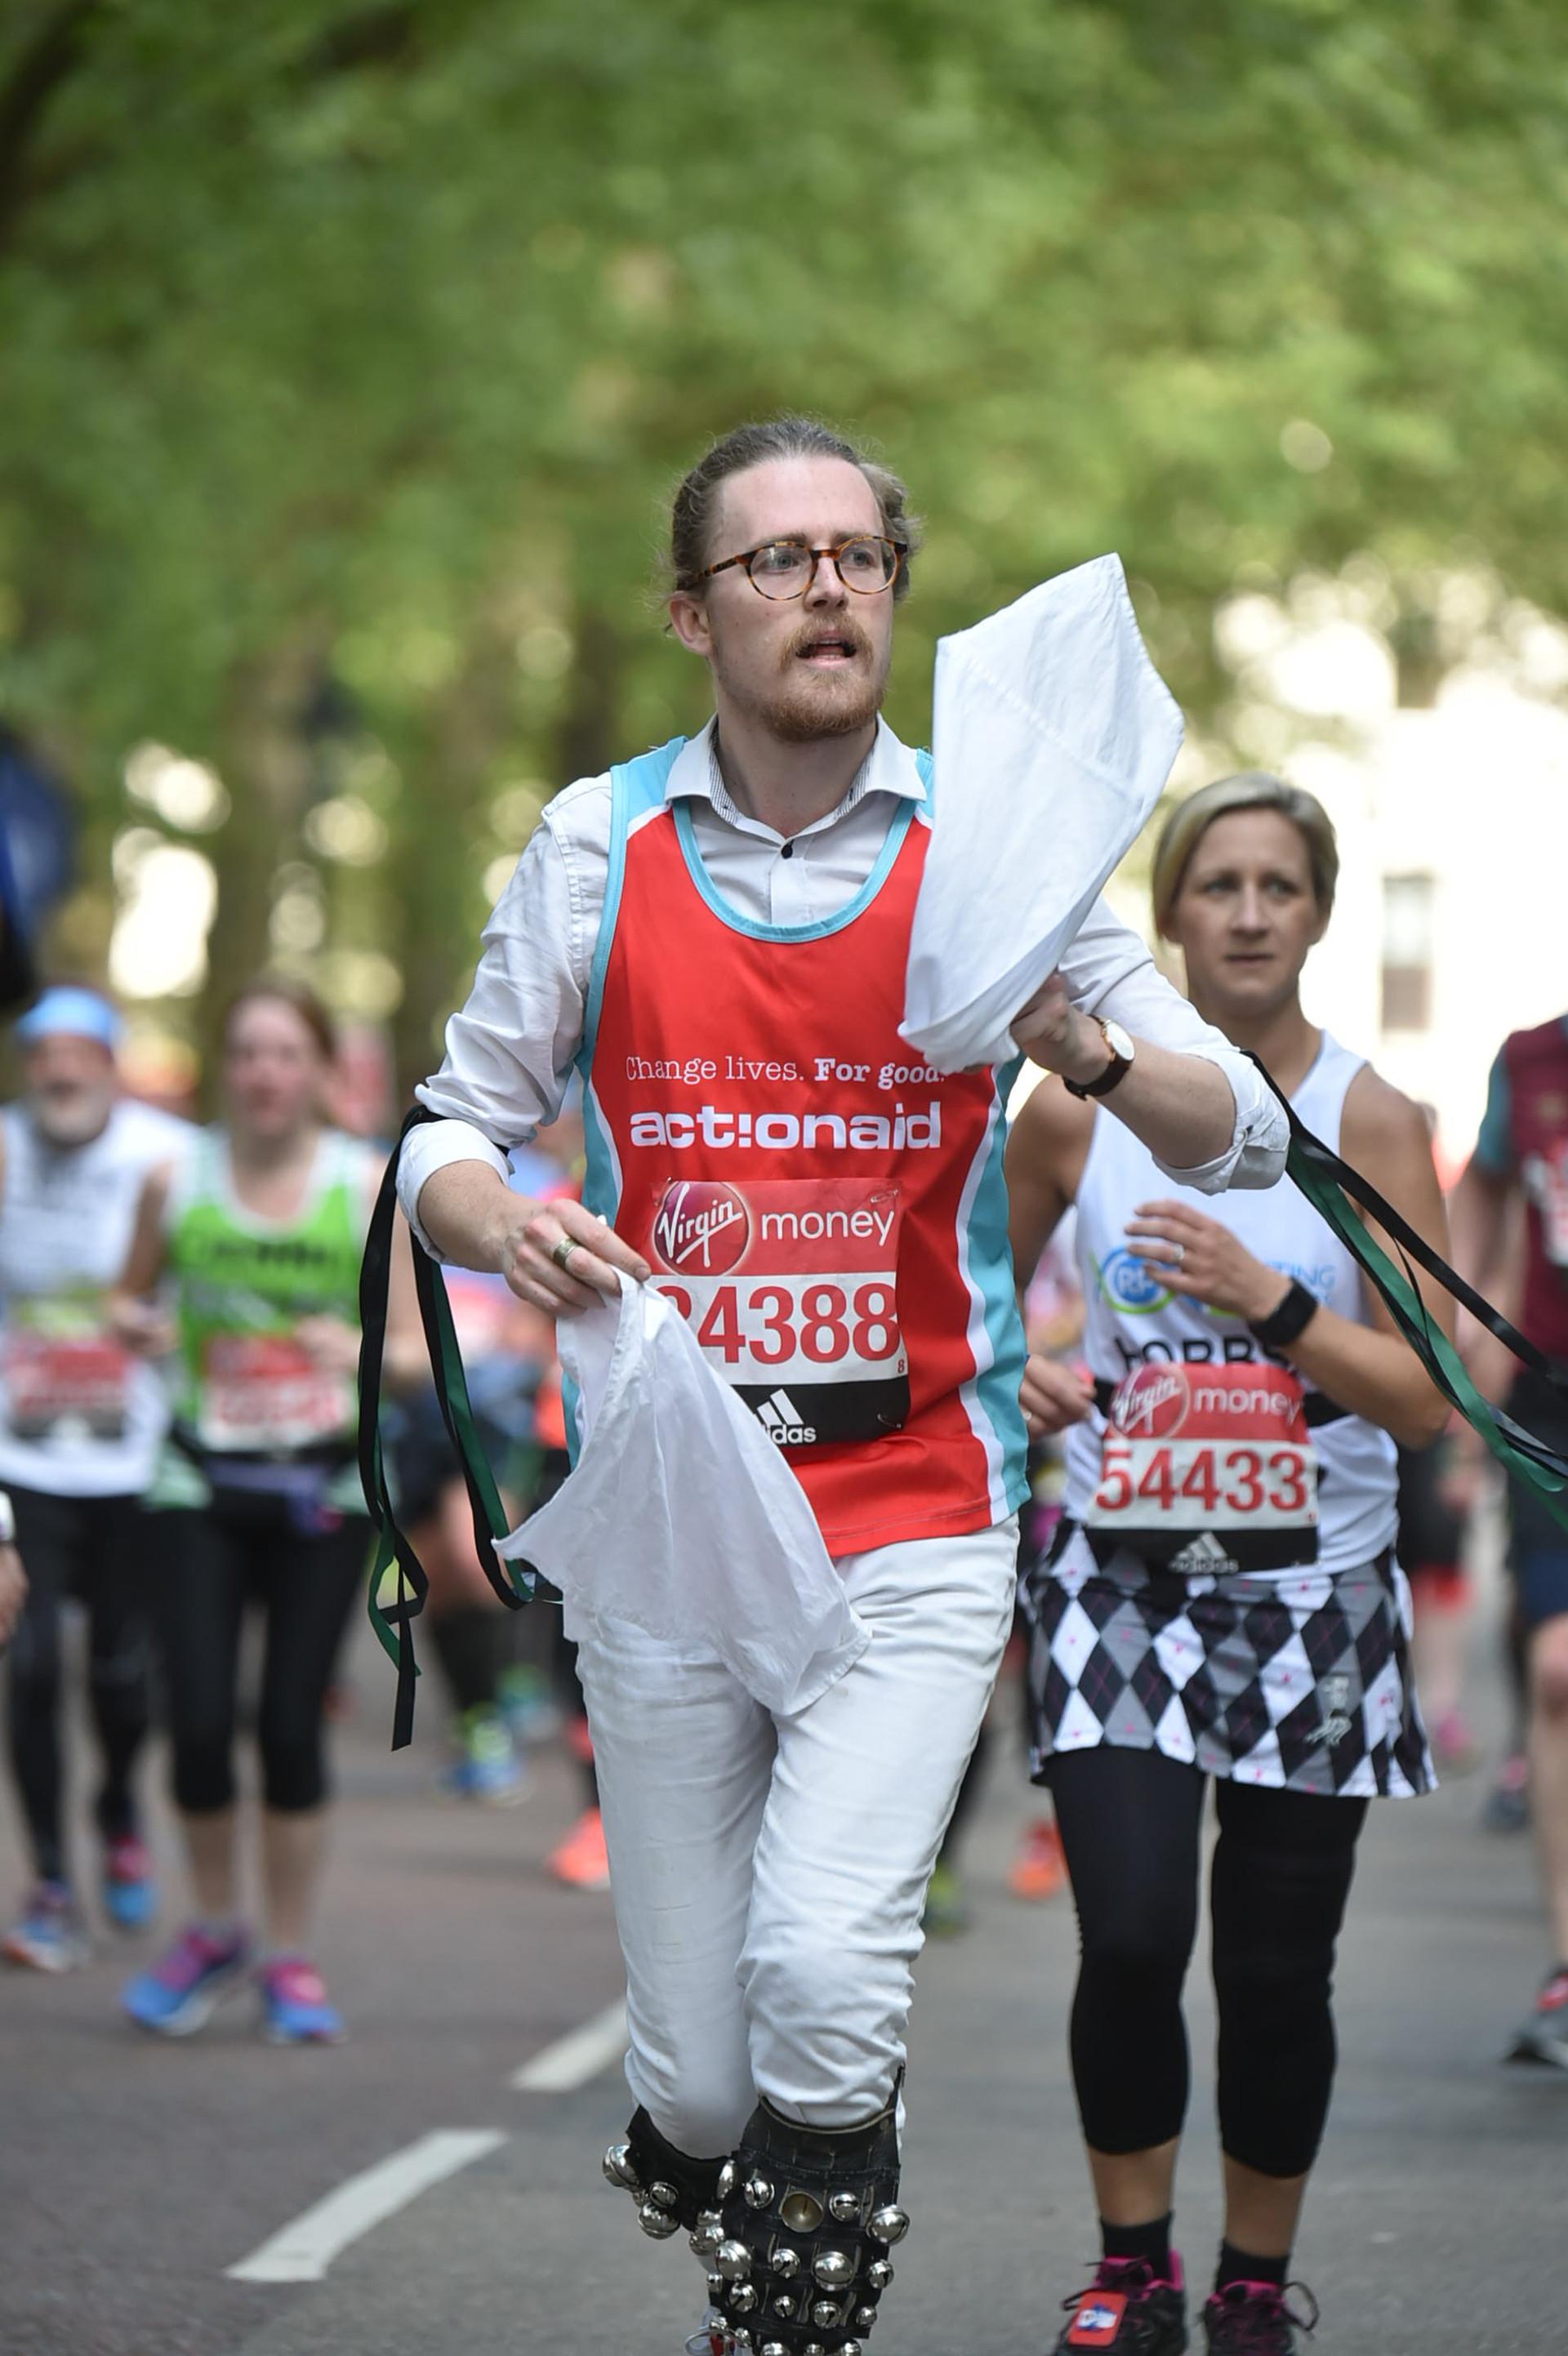 Ben Morris dancing the London Marathon in 2017